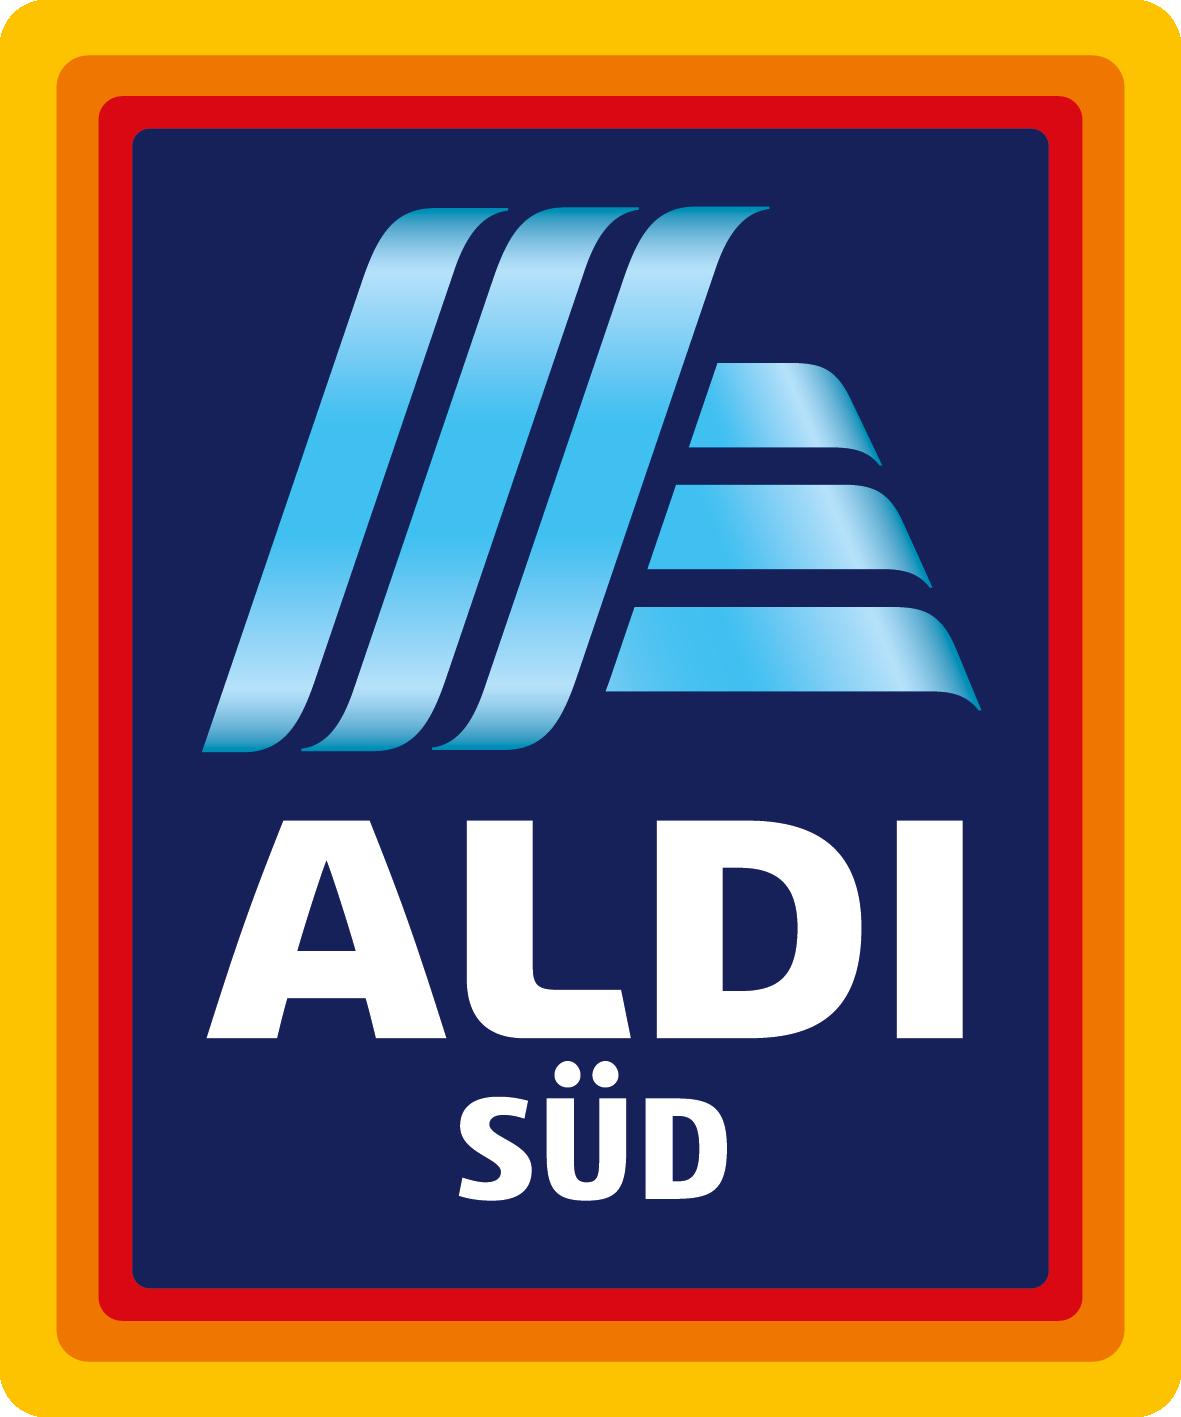 ALDI SÜDLogo Image